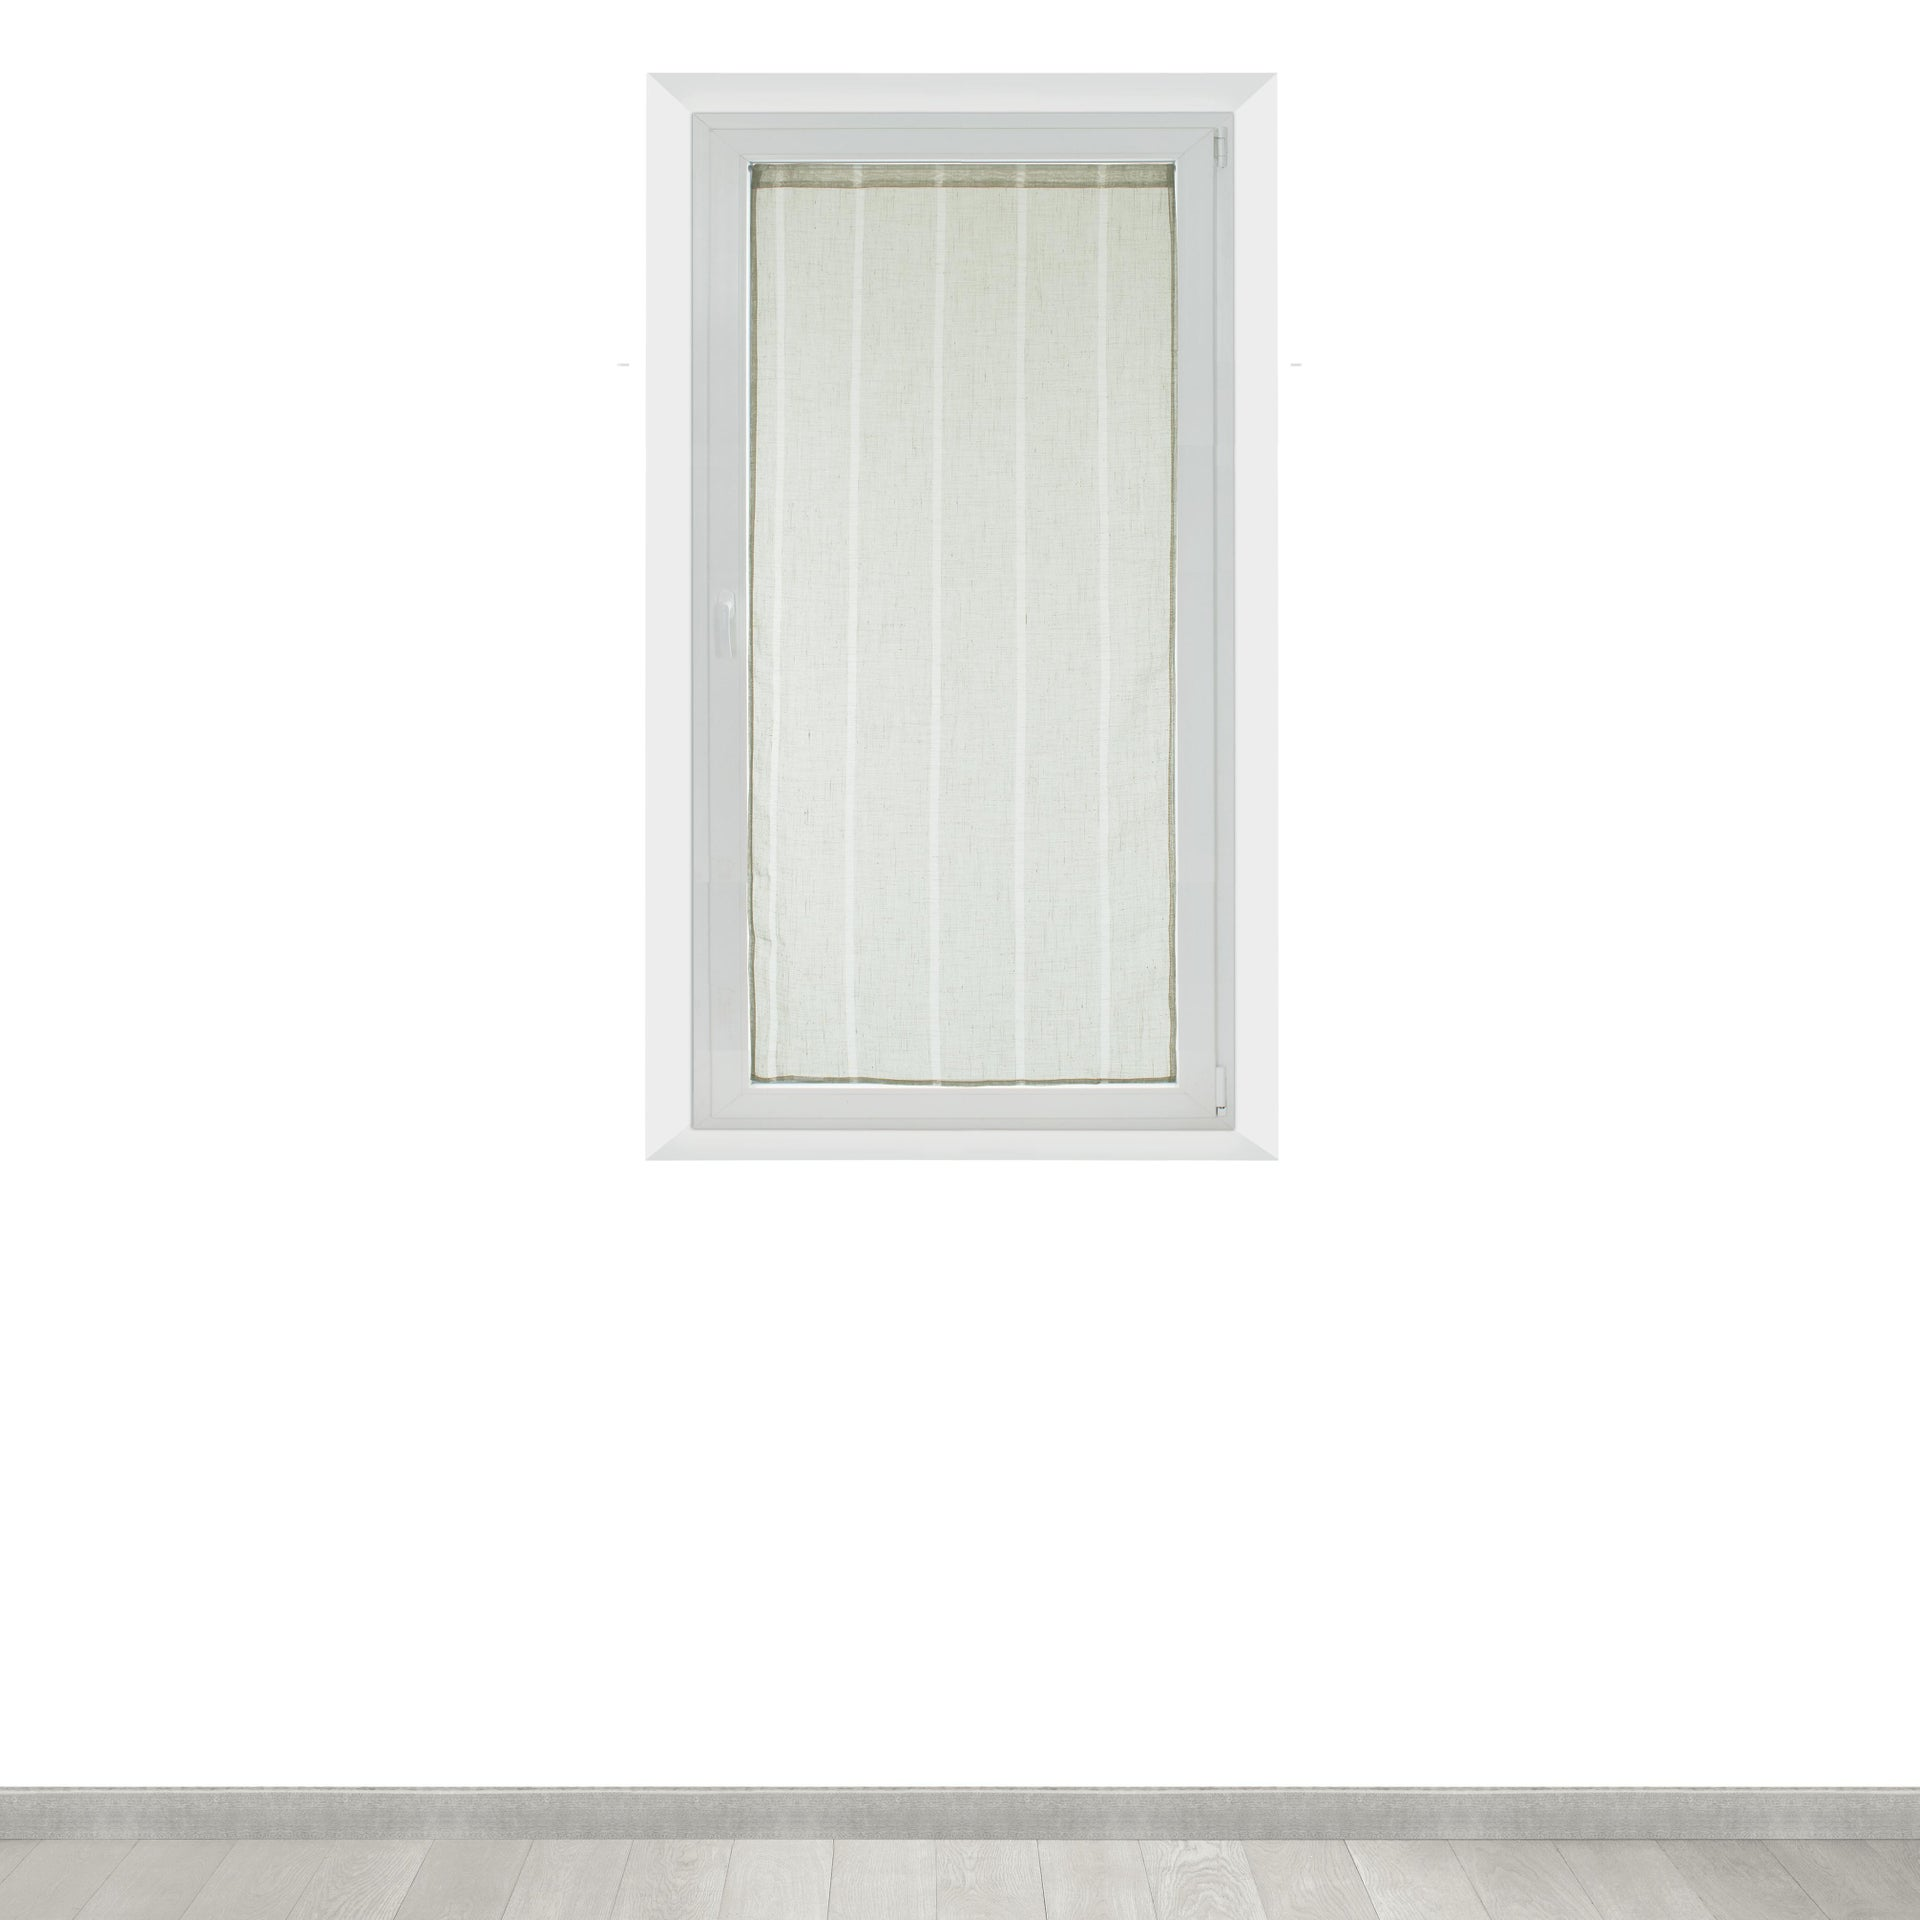 Tendina vetro Lippia tortora tunnel 60 x 160 cm - 2